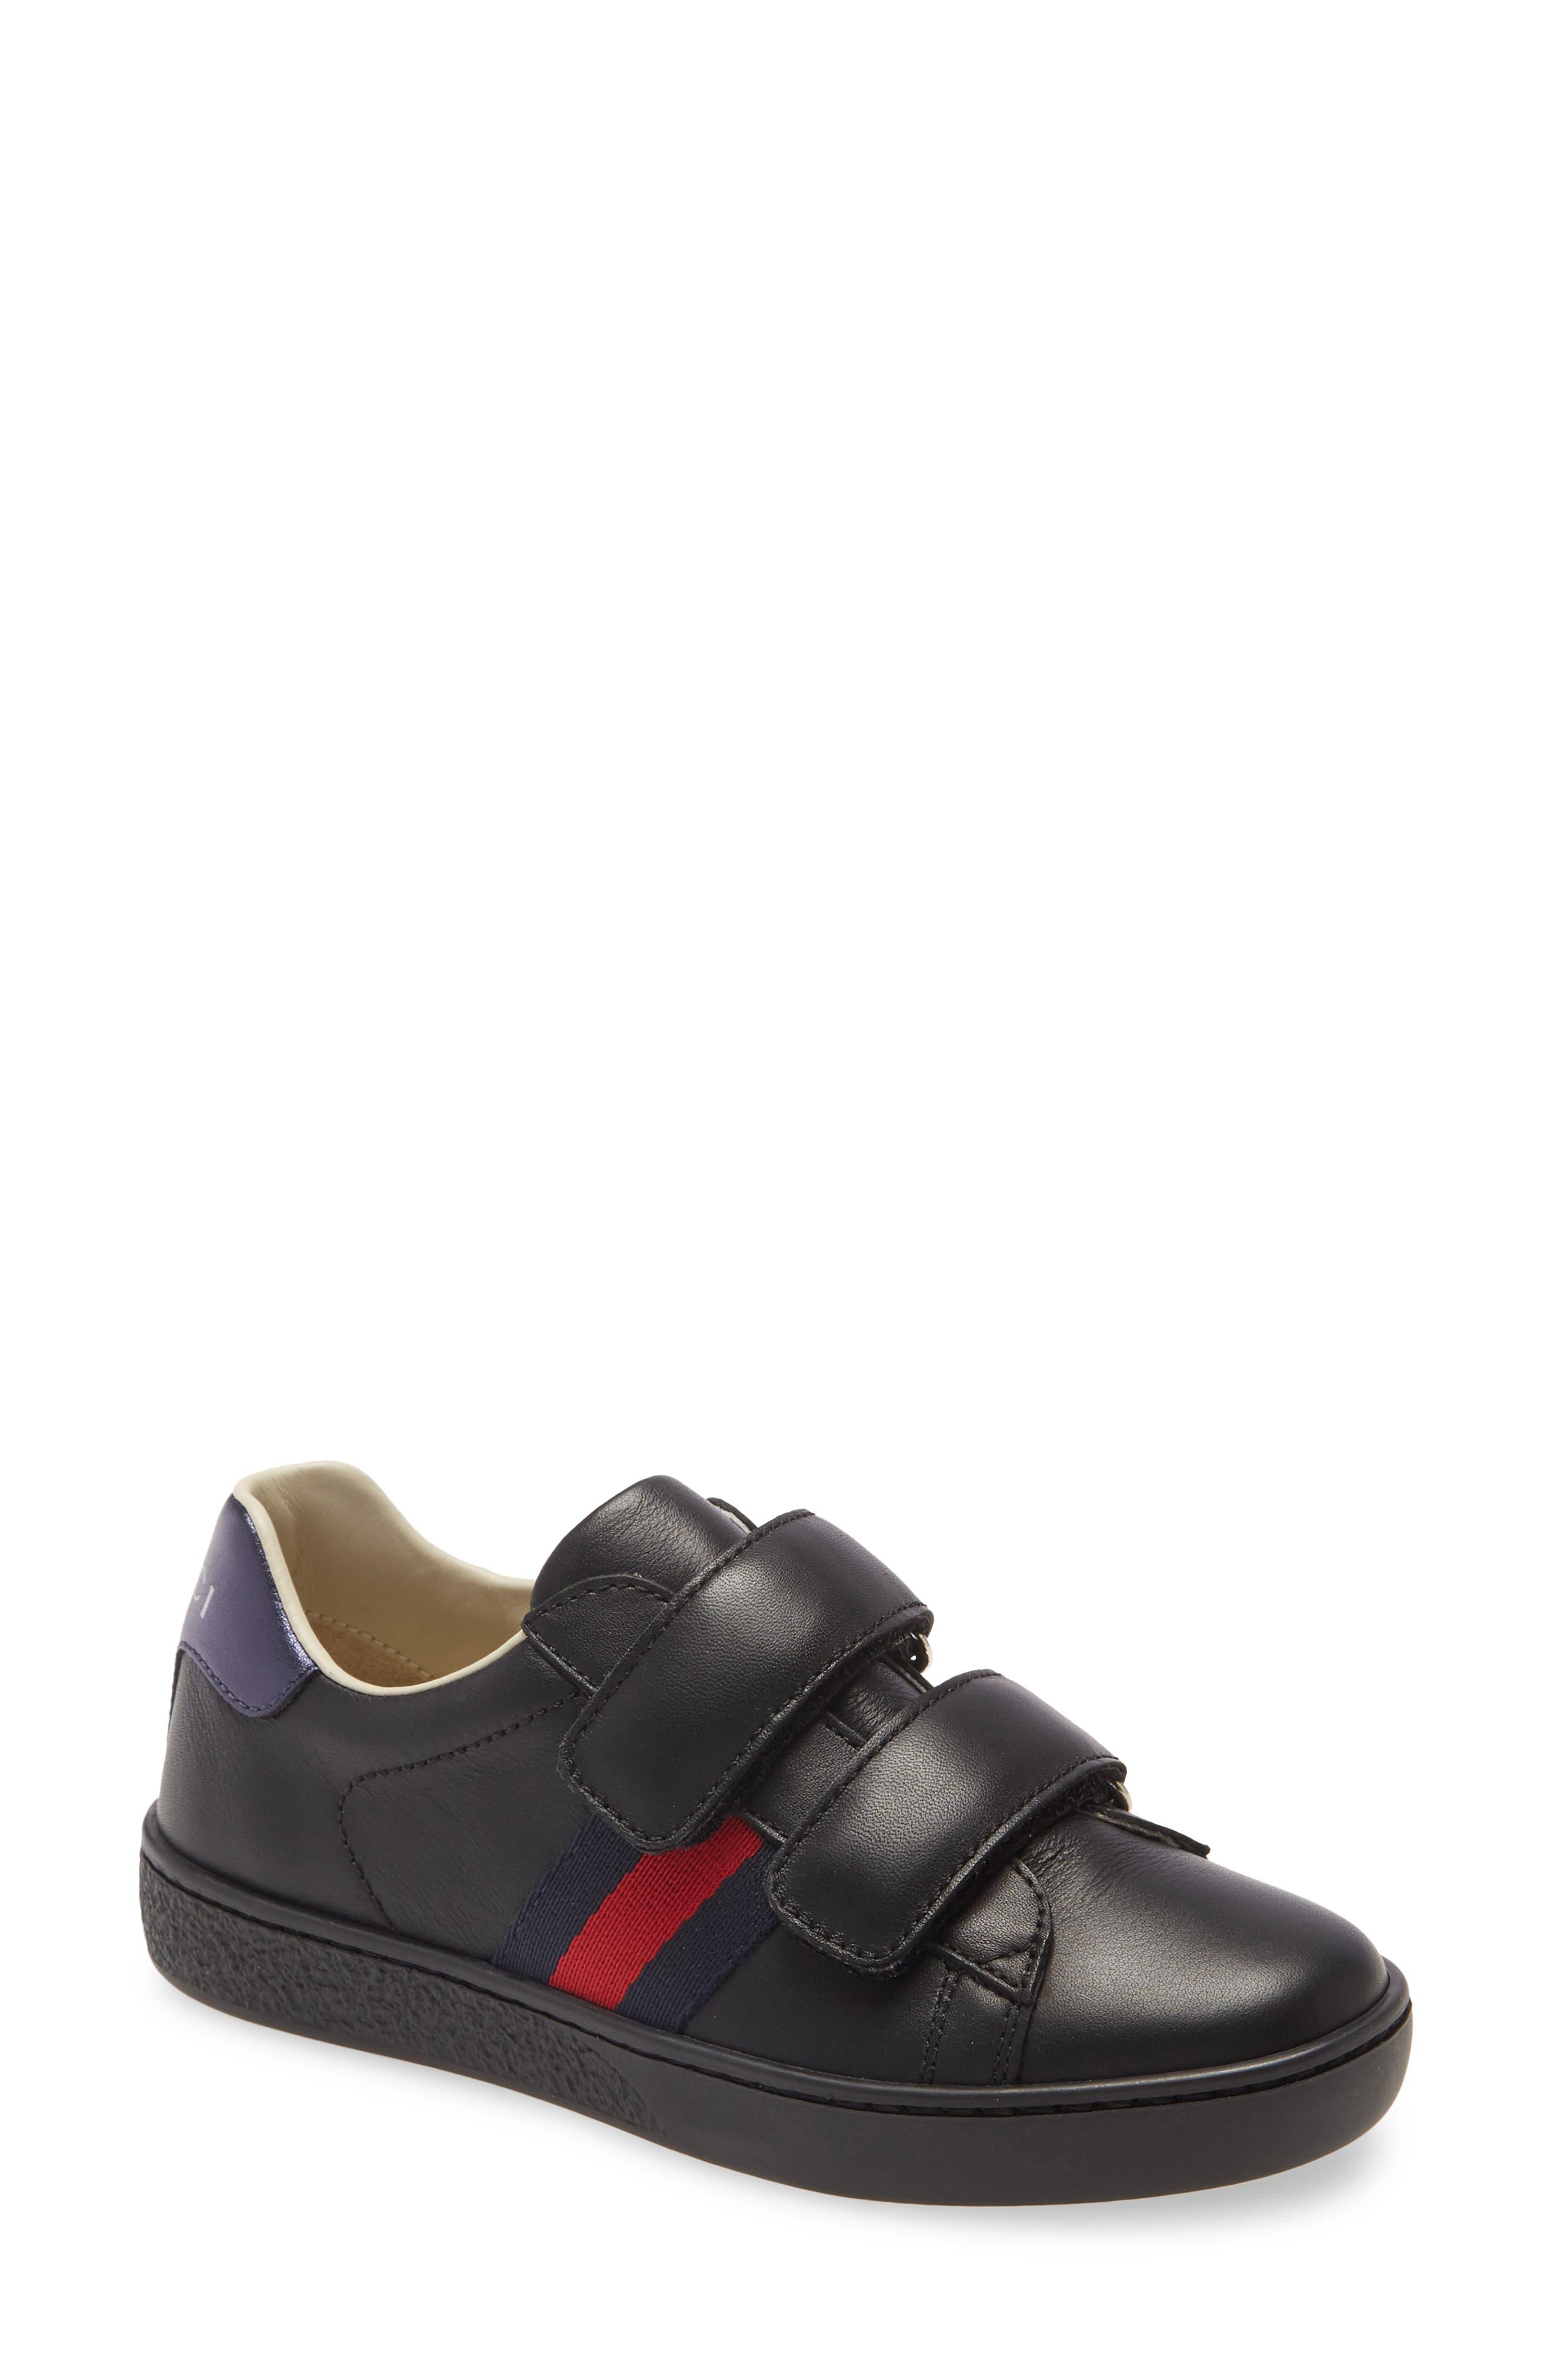 Girls' Gucci Shoes